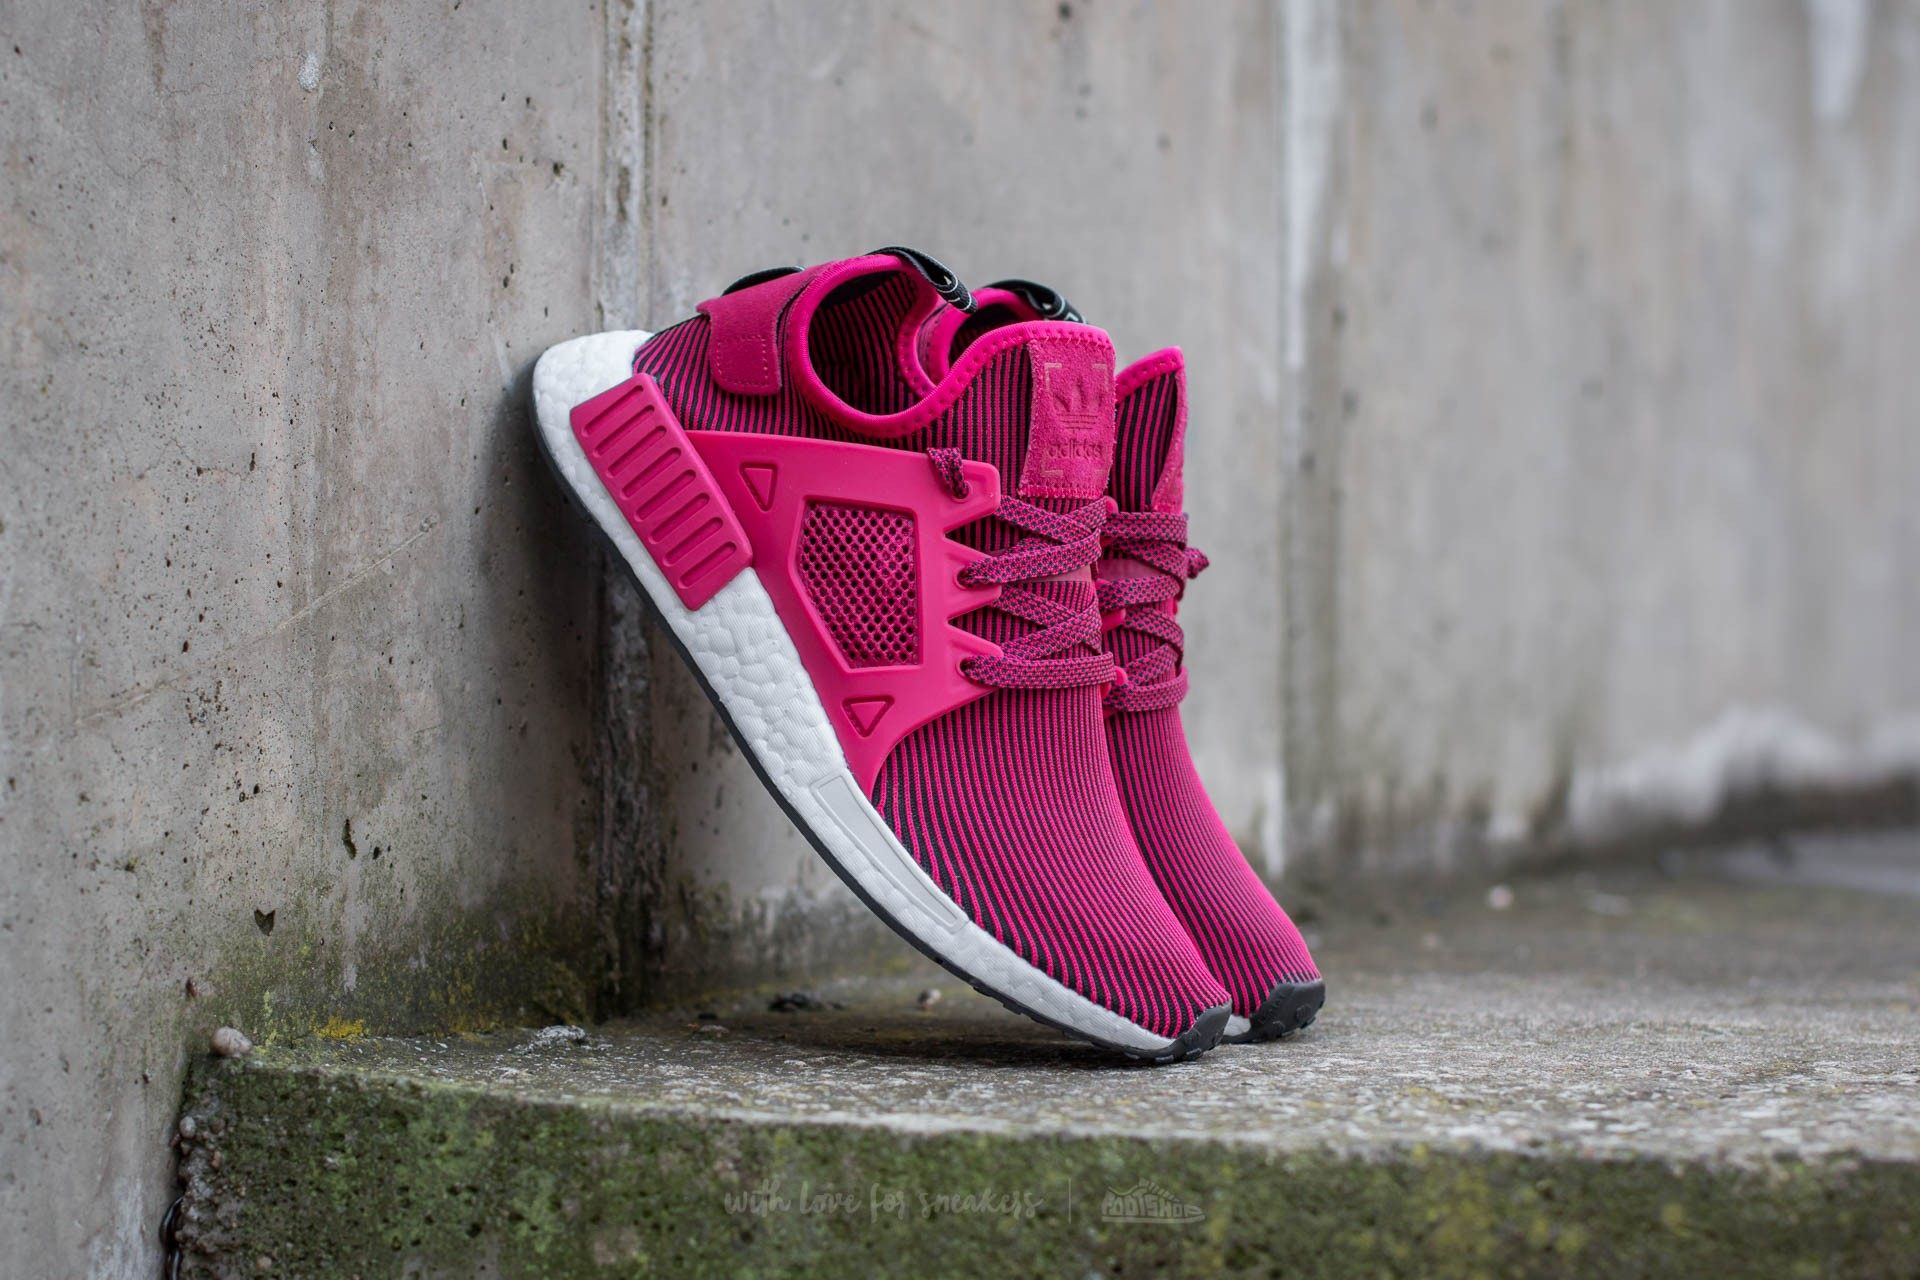 8e37f0e88 adidas NMD XR1 Primeknit W Unity Pink  Unity Pink  Core Black ...